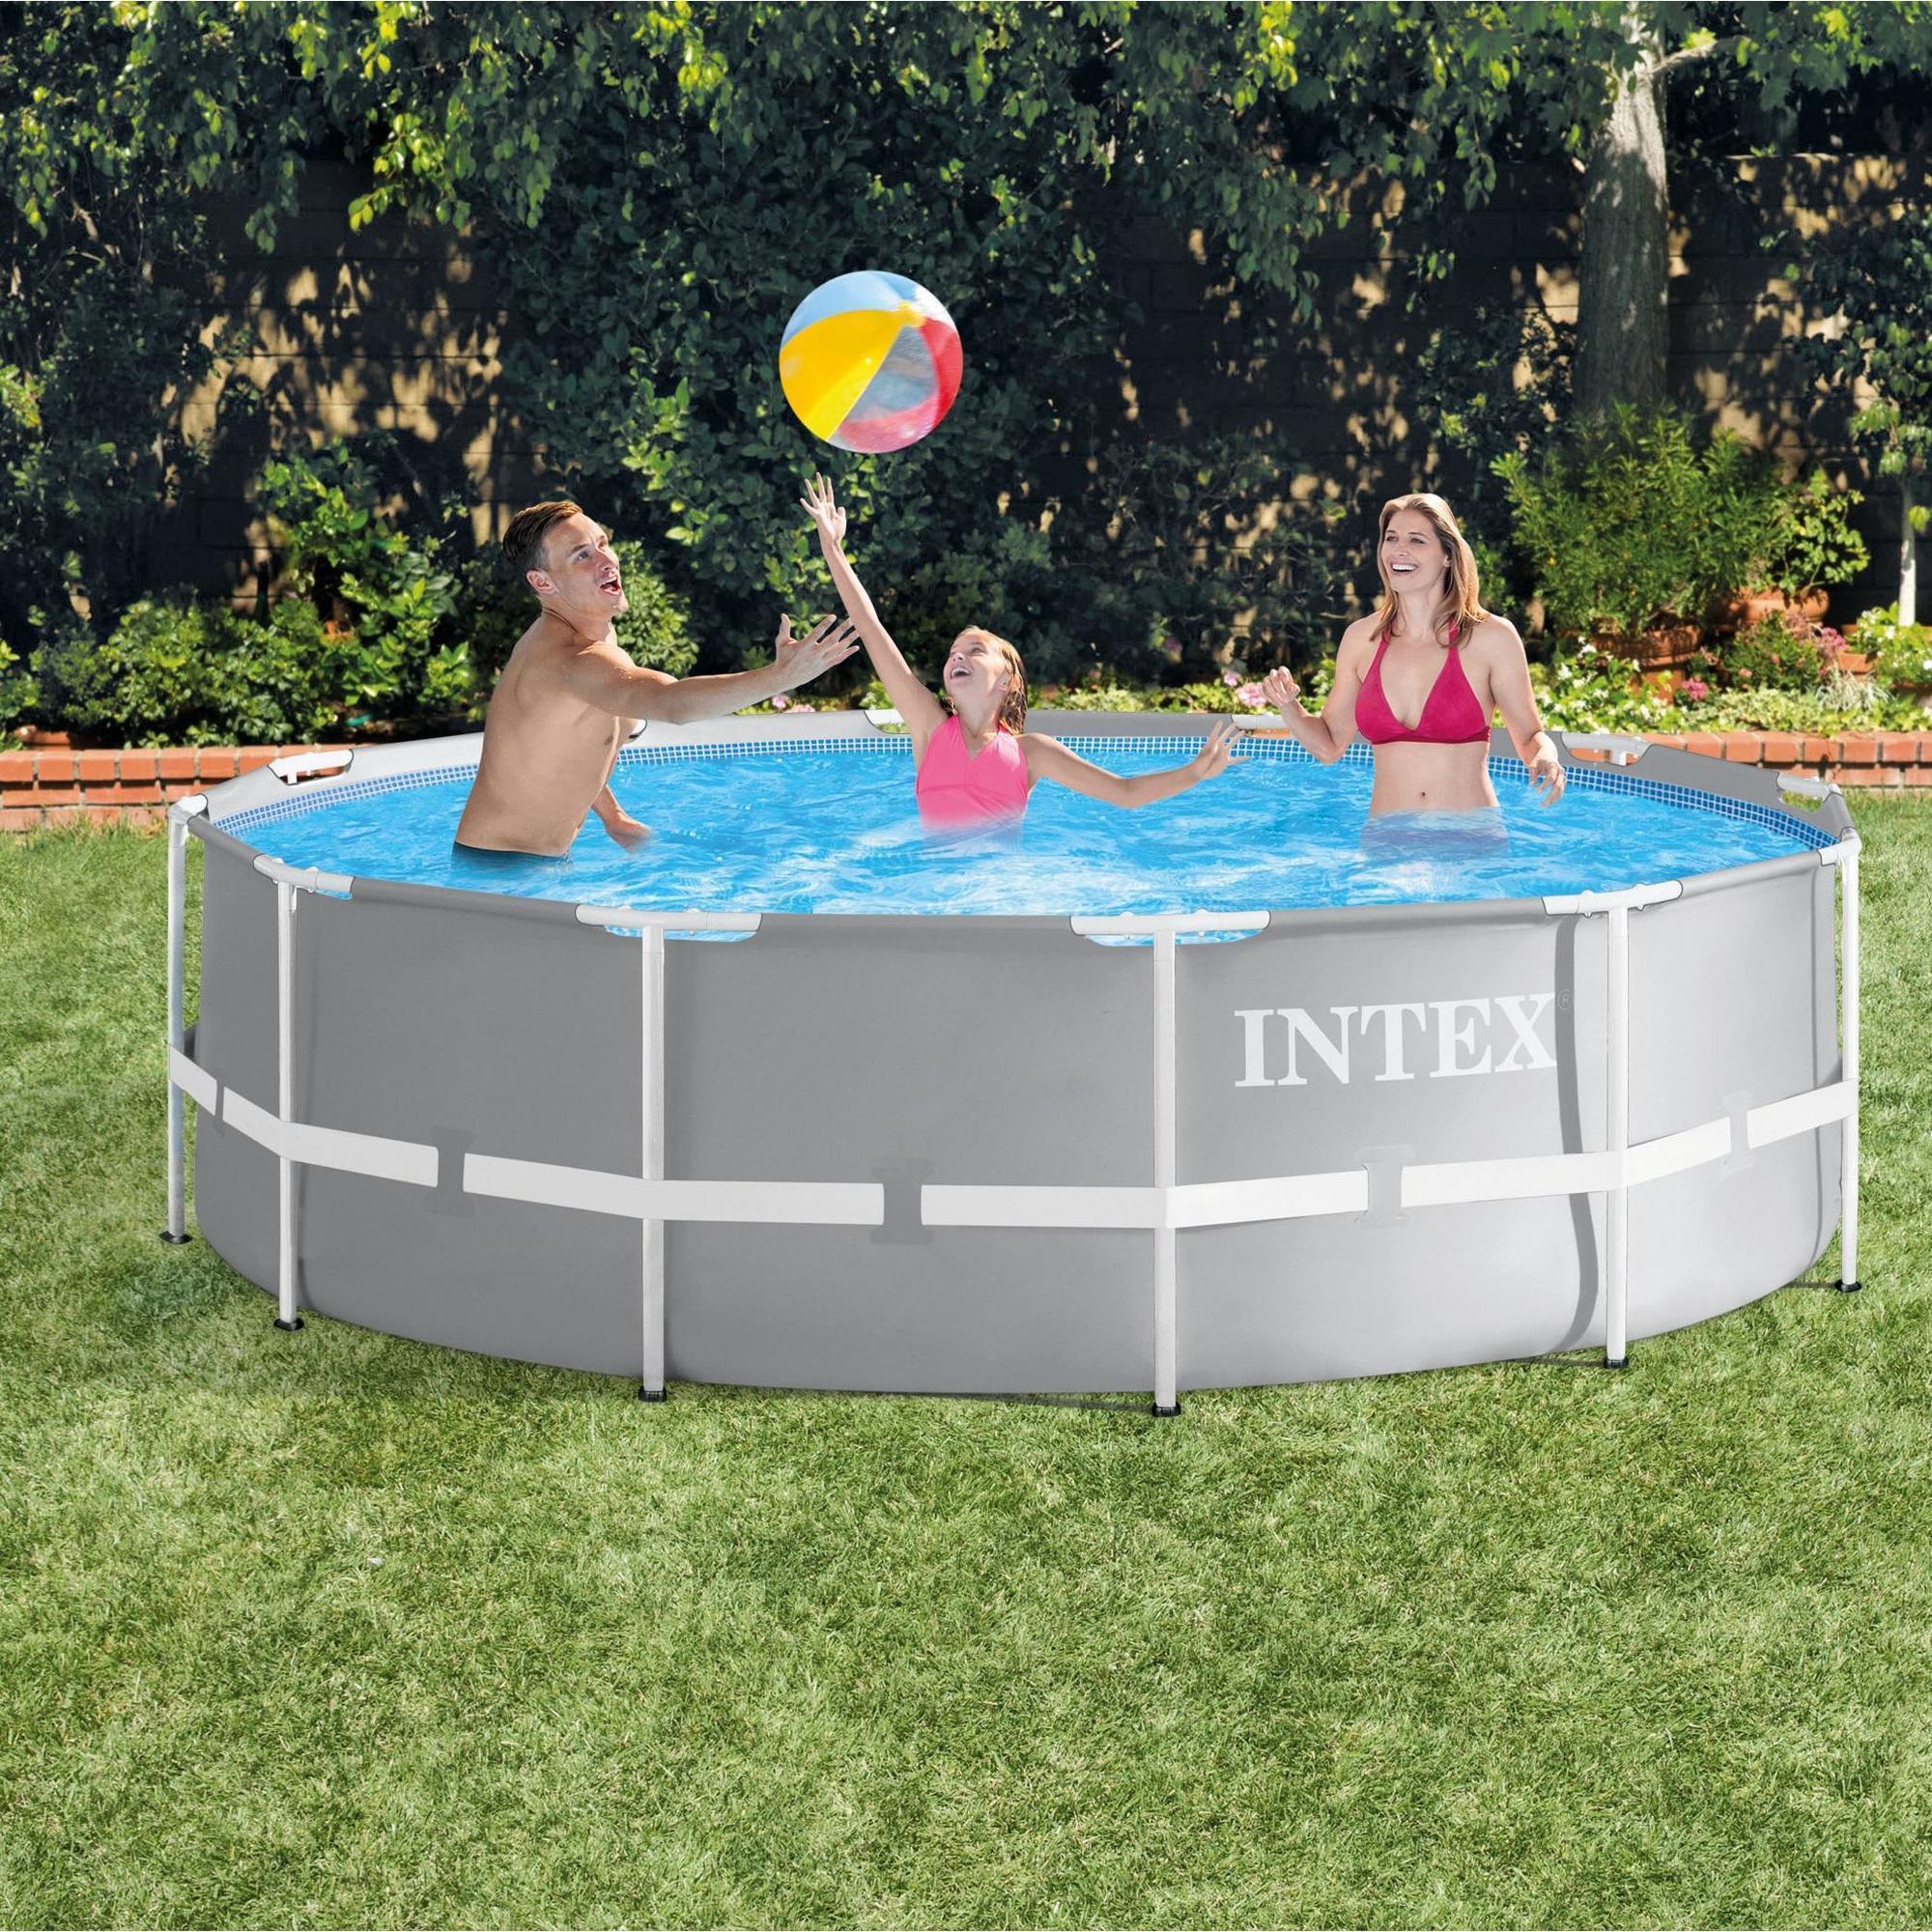 Intex Grande Piscine Tubulaire Intex 366x99 Decathlon